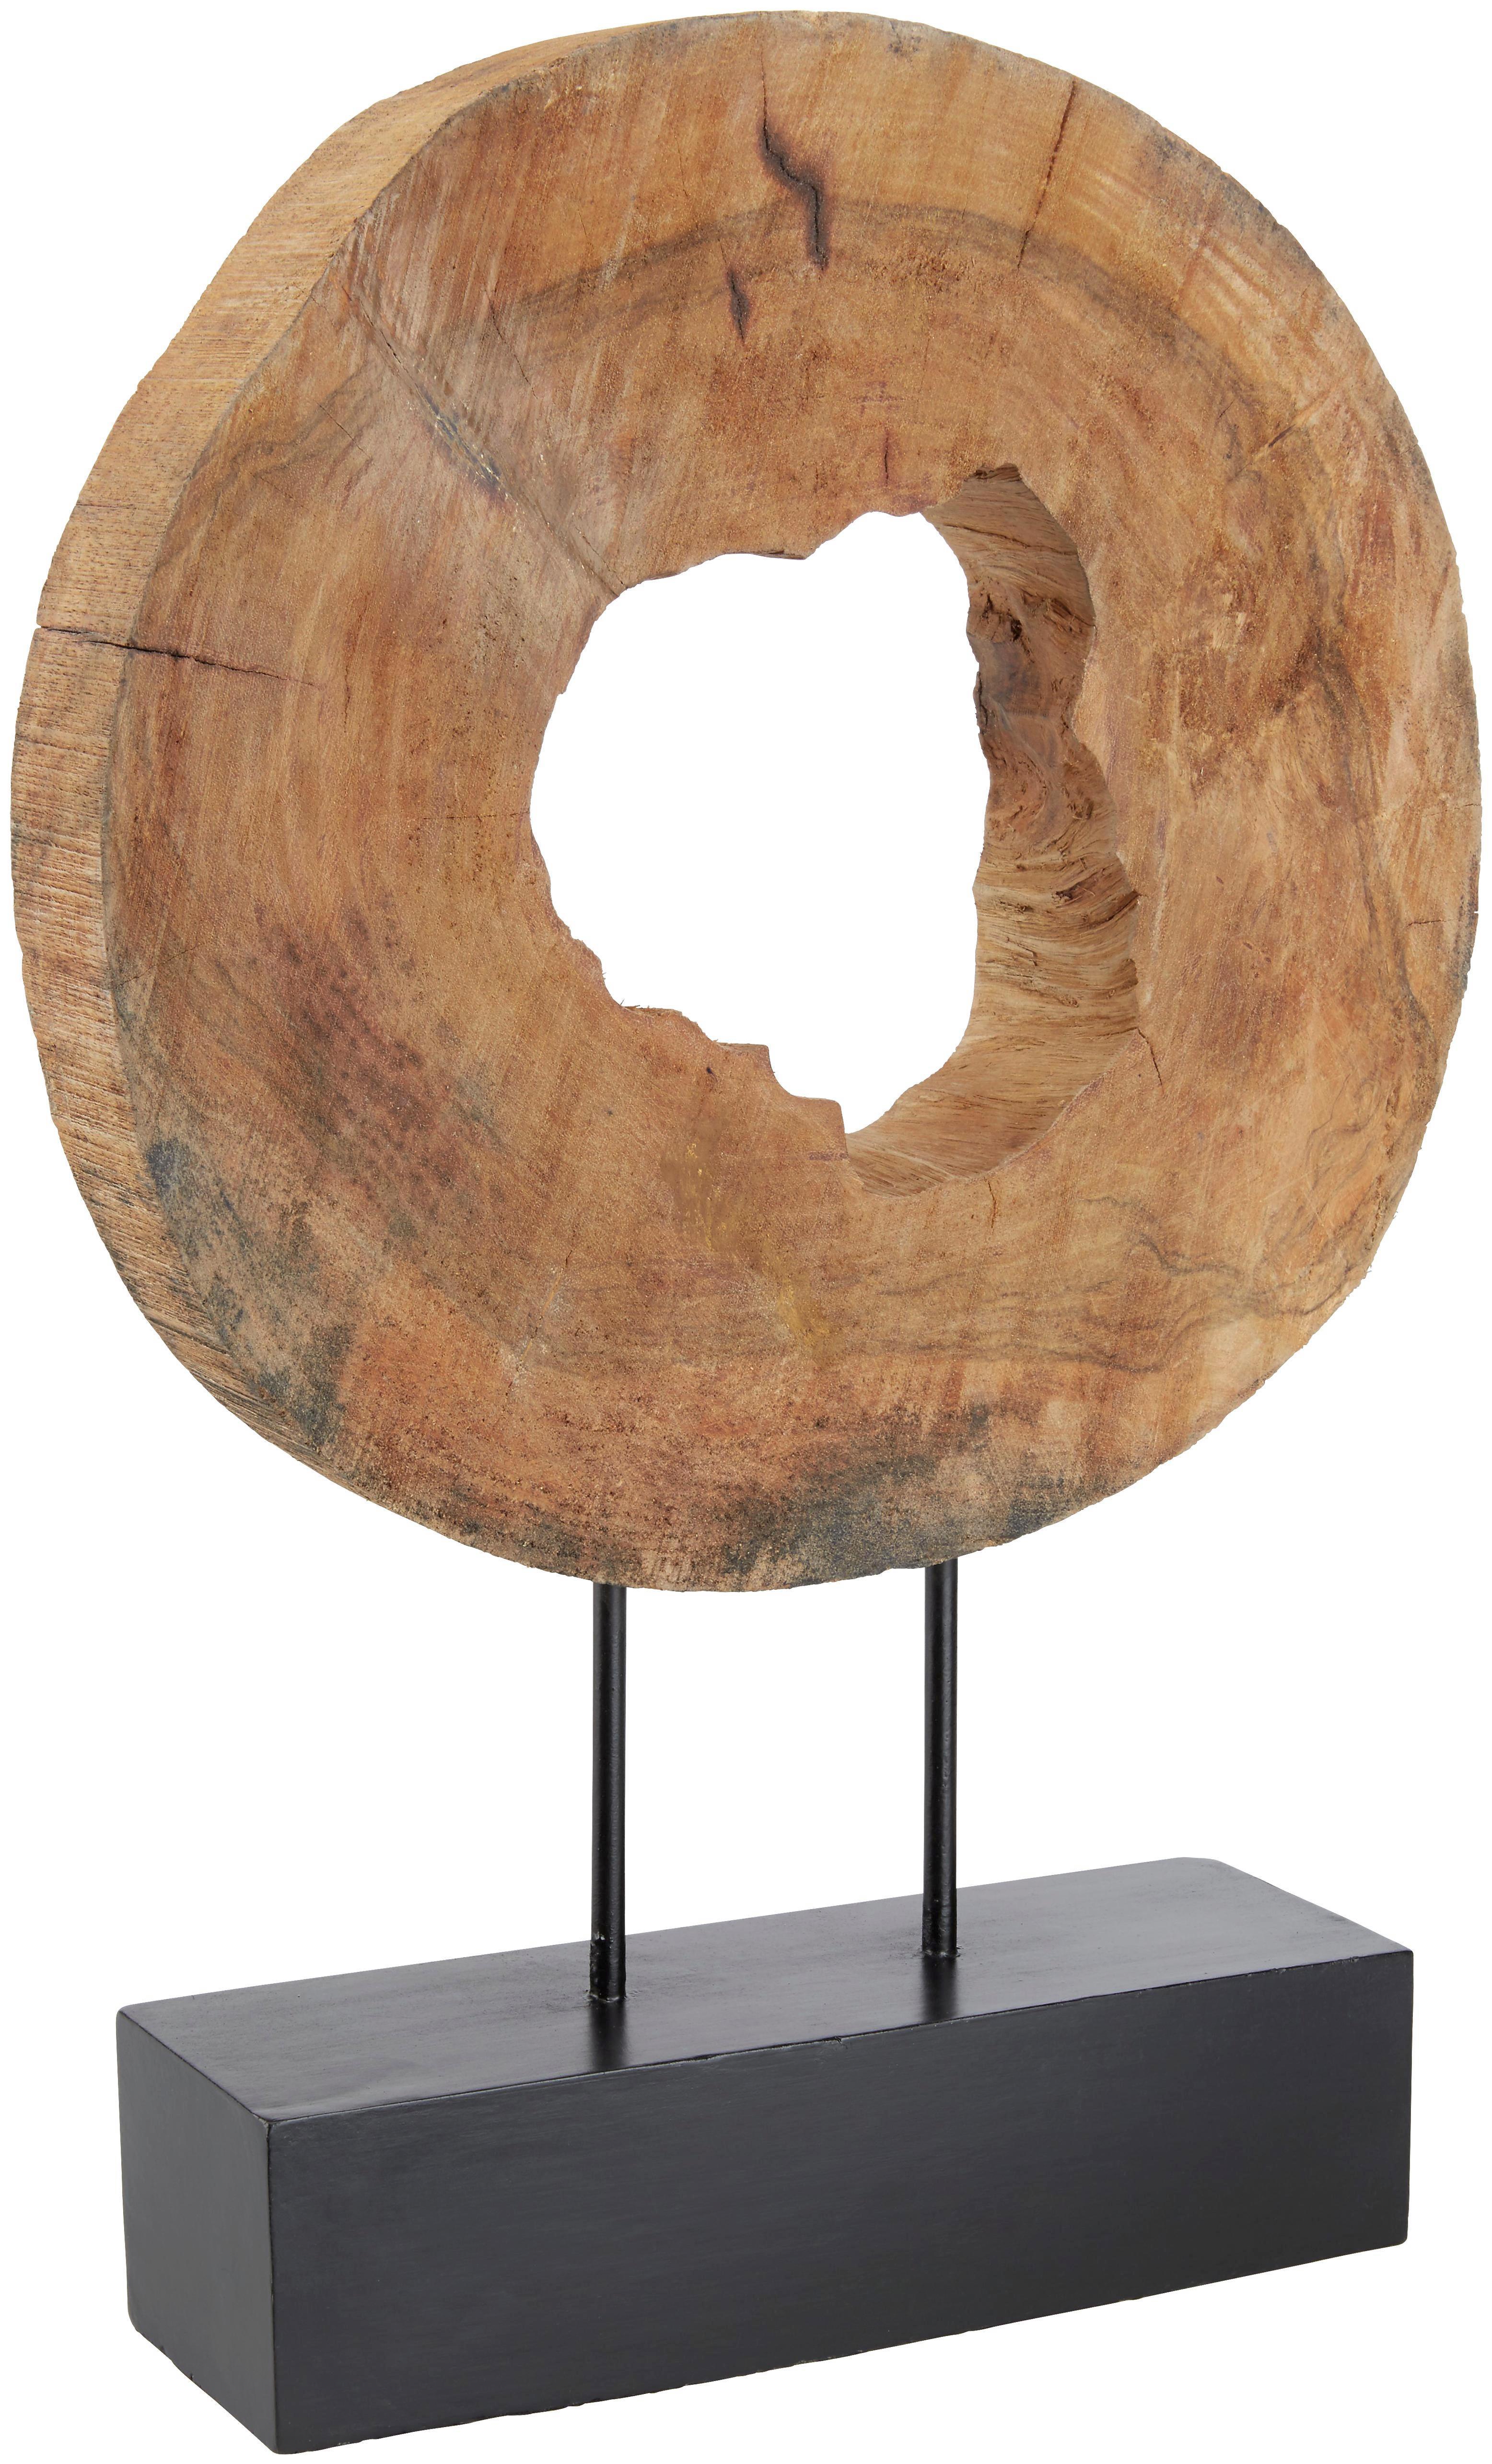 Skulptur Shanter in Natur/Schwarz - Schwarz/Naturfarben, ROMANTIK / LANDHAUS, Holz/Metall (38/52/8cm) - MÖMAX modern living